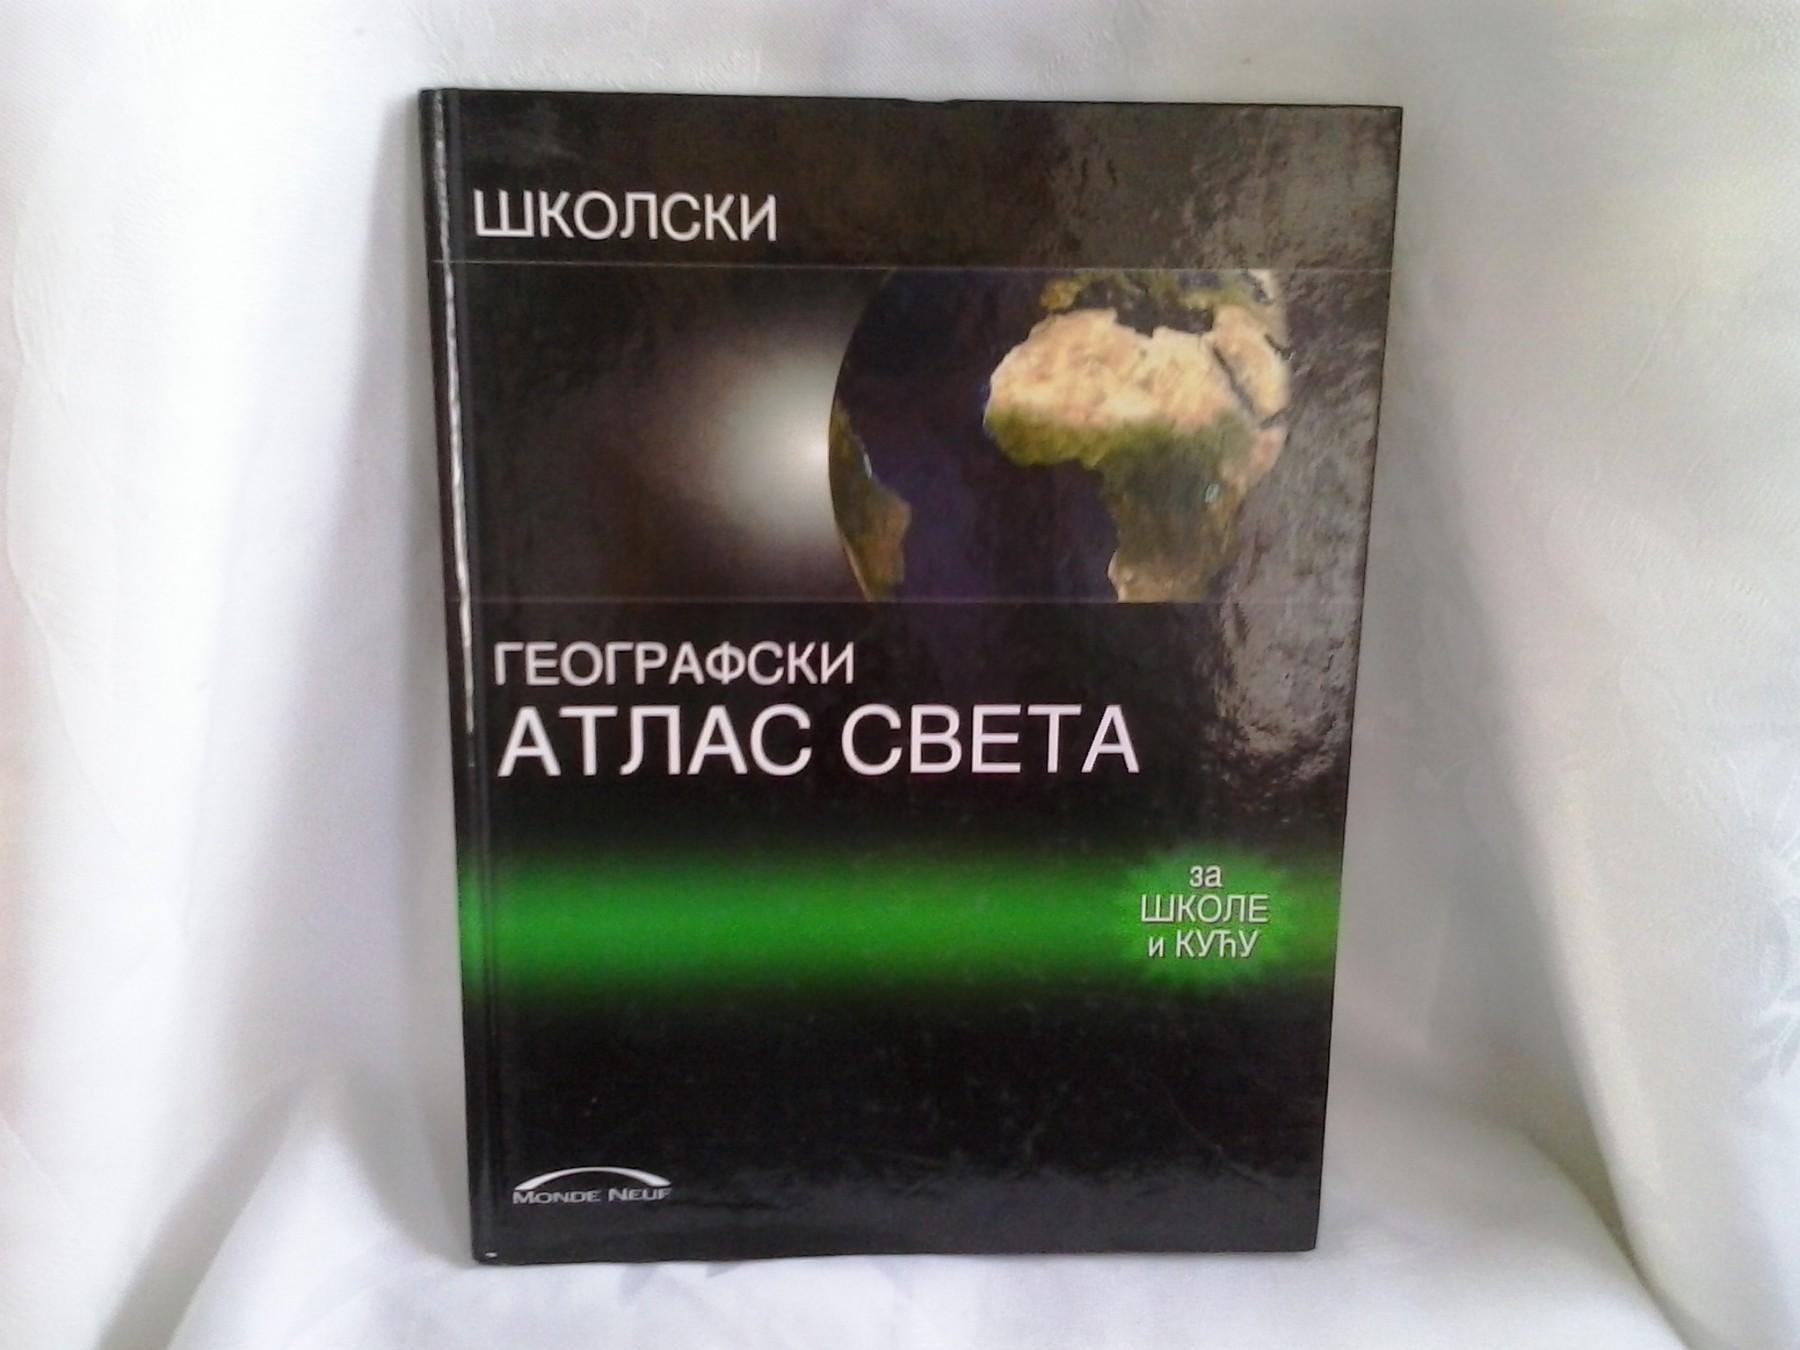 geografski atlas sveta